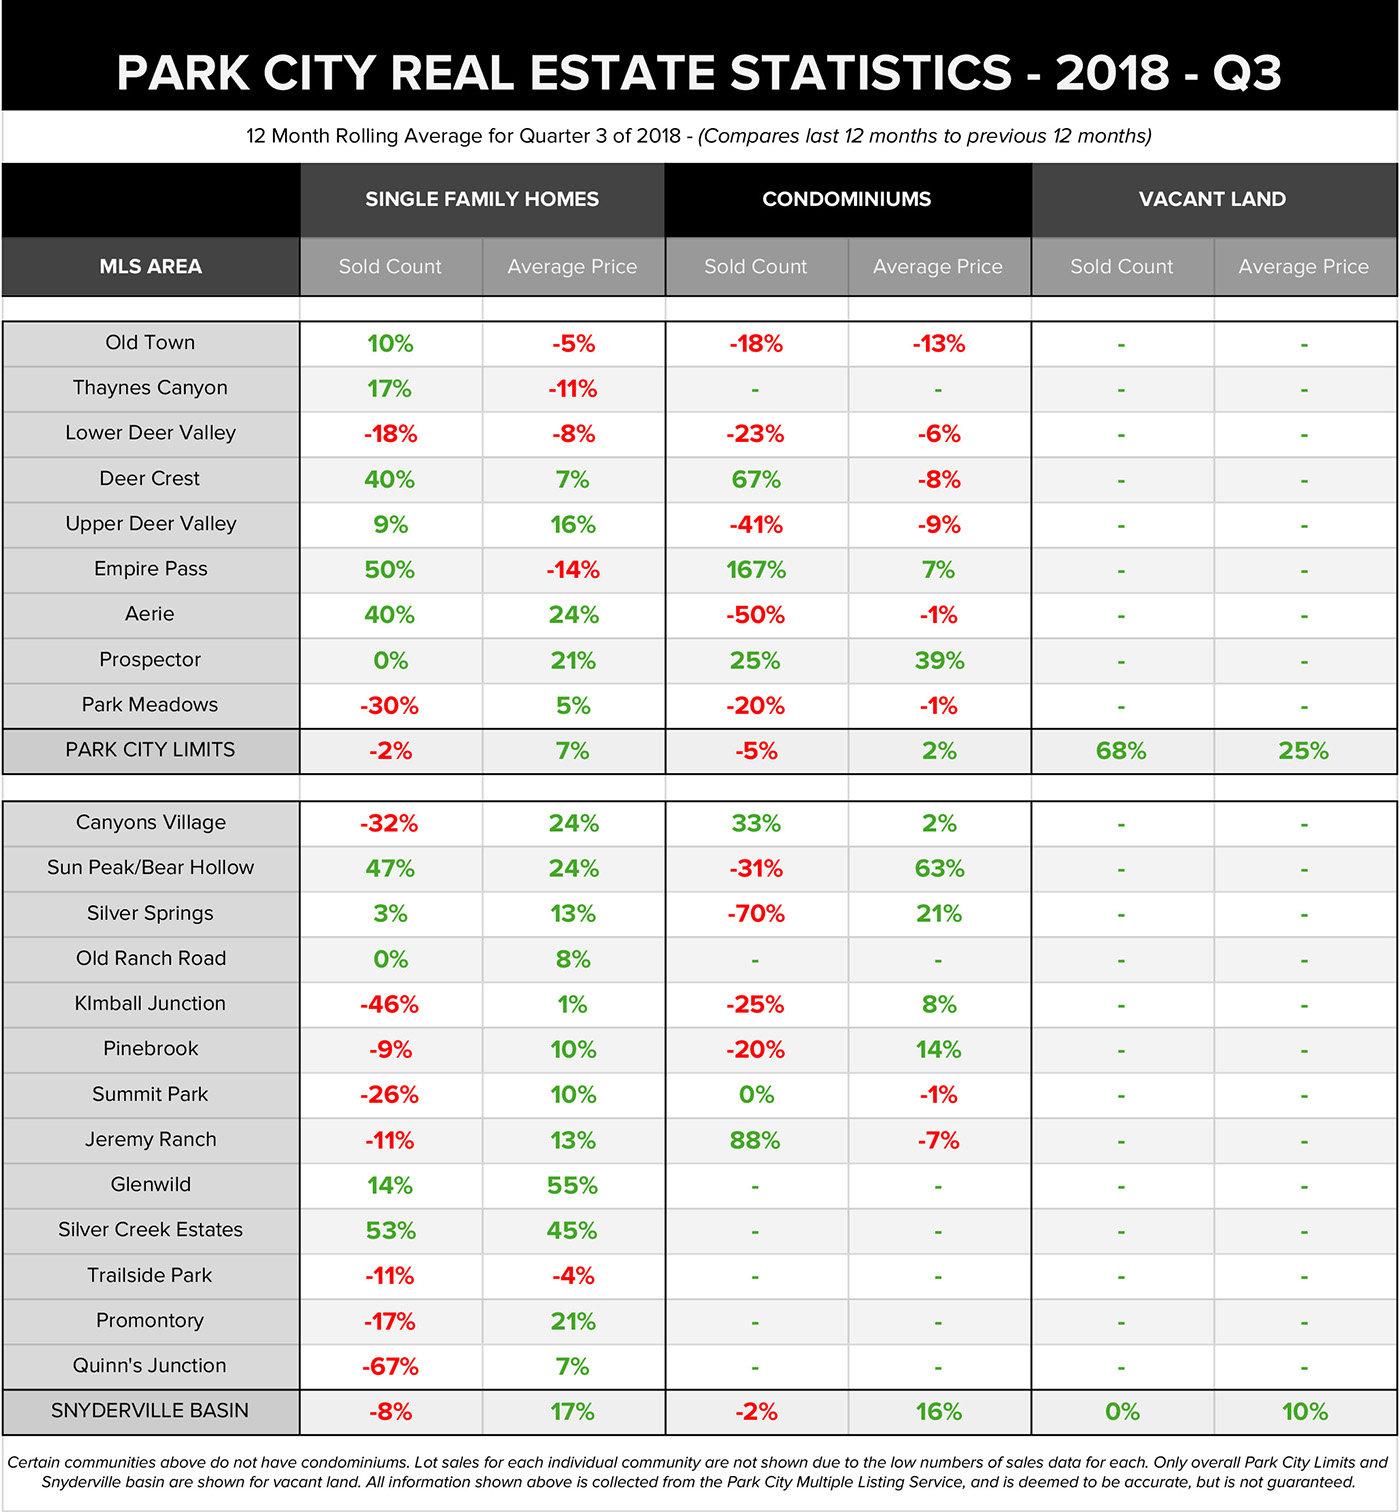 Park City Real Estate Statistics